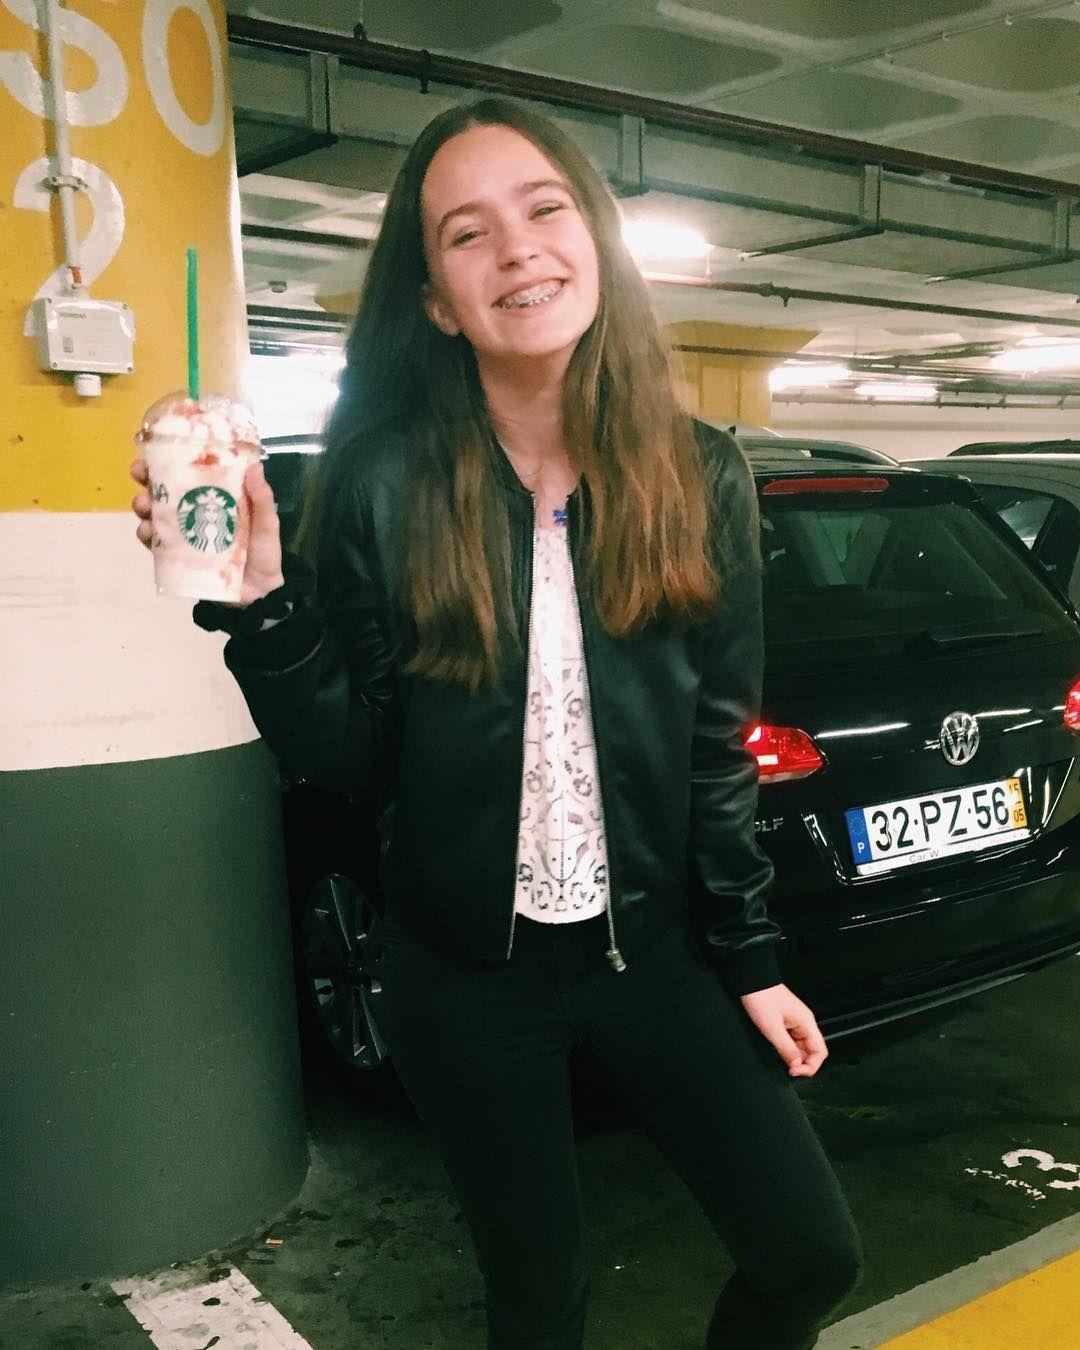 A felicidade da criança ������♀️ #airport#lisbon#starbucks#frapucchino#morango#happy#crazygirl#car#tumblrgirl#Portugal#pleasecomment#pleaselike#followme#photography#love#face#balckwhite http://tipsrazzi.com/ipost/1507512140516235034/?code=BTrwk3-Dxca